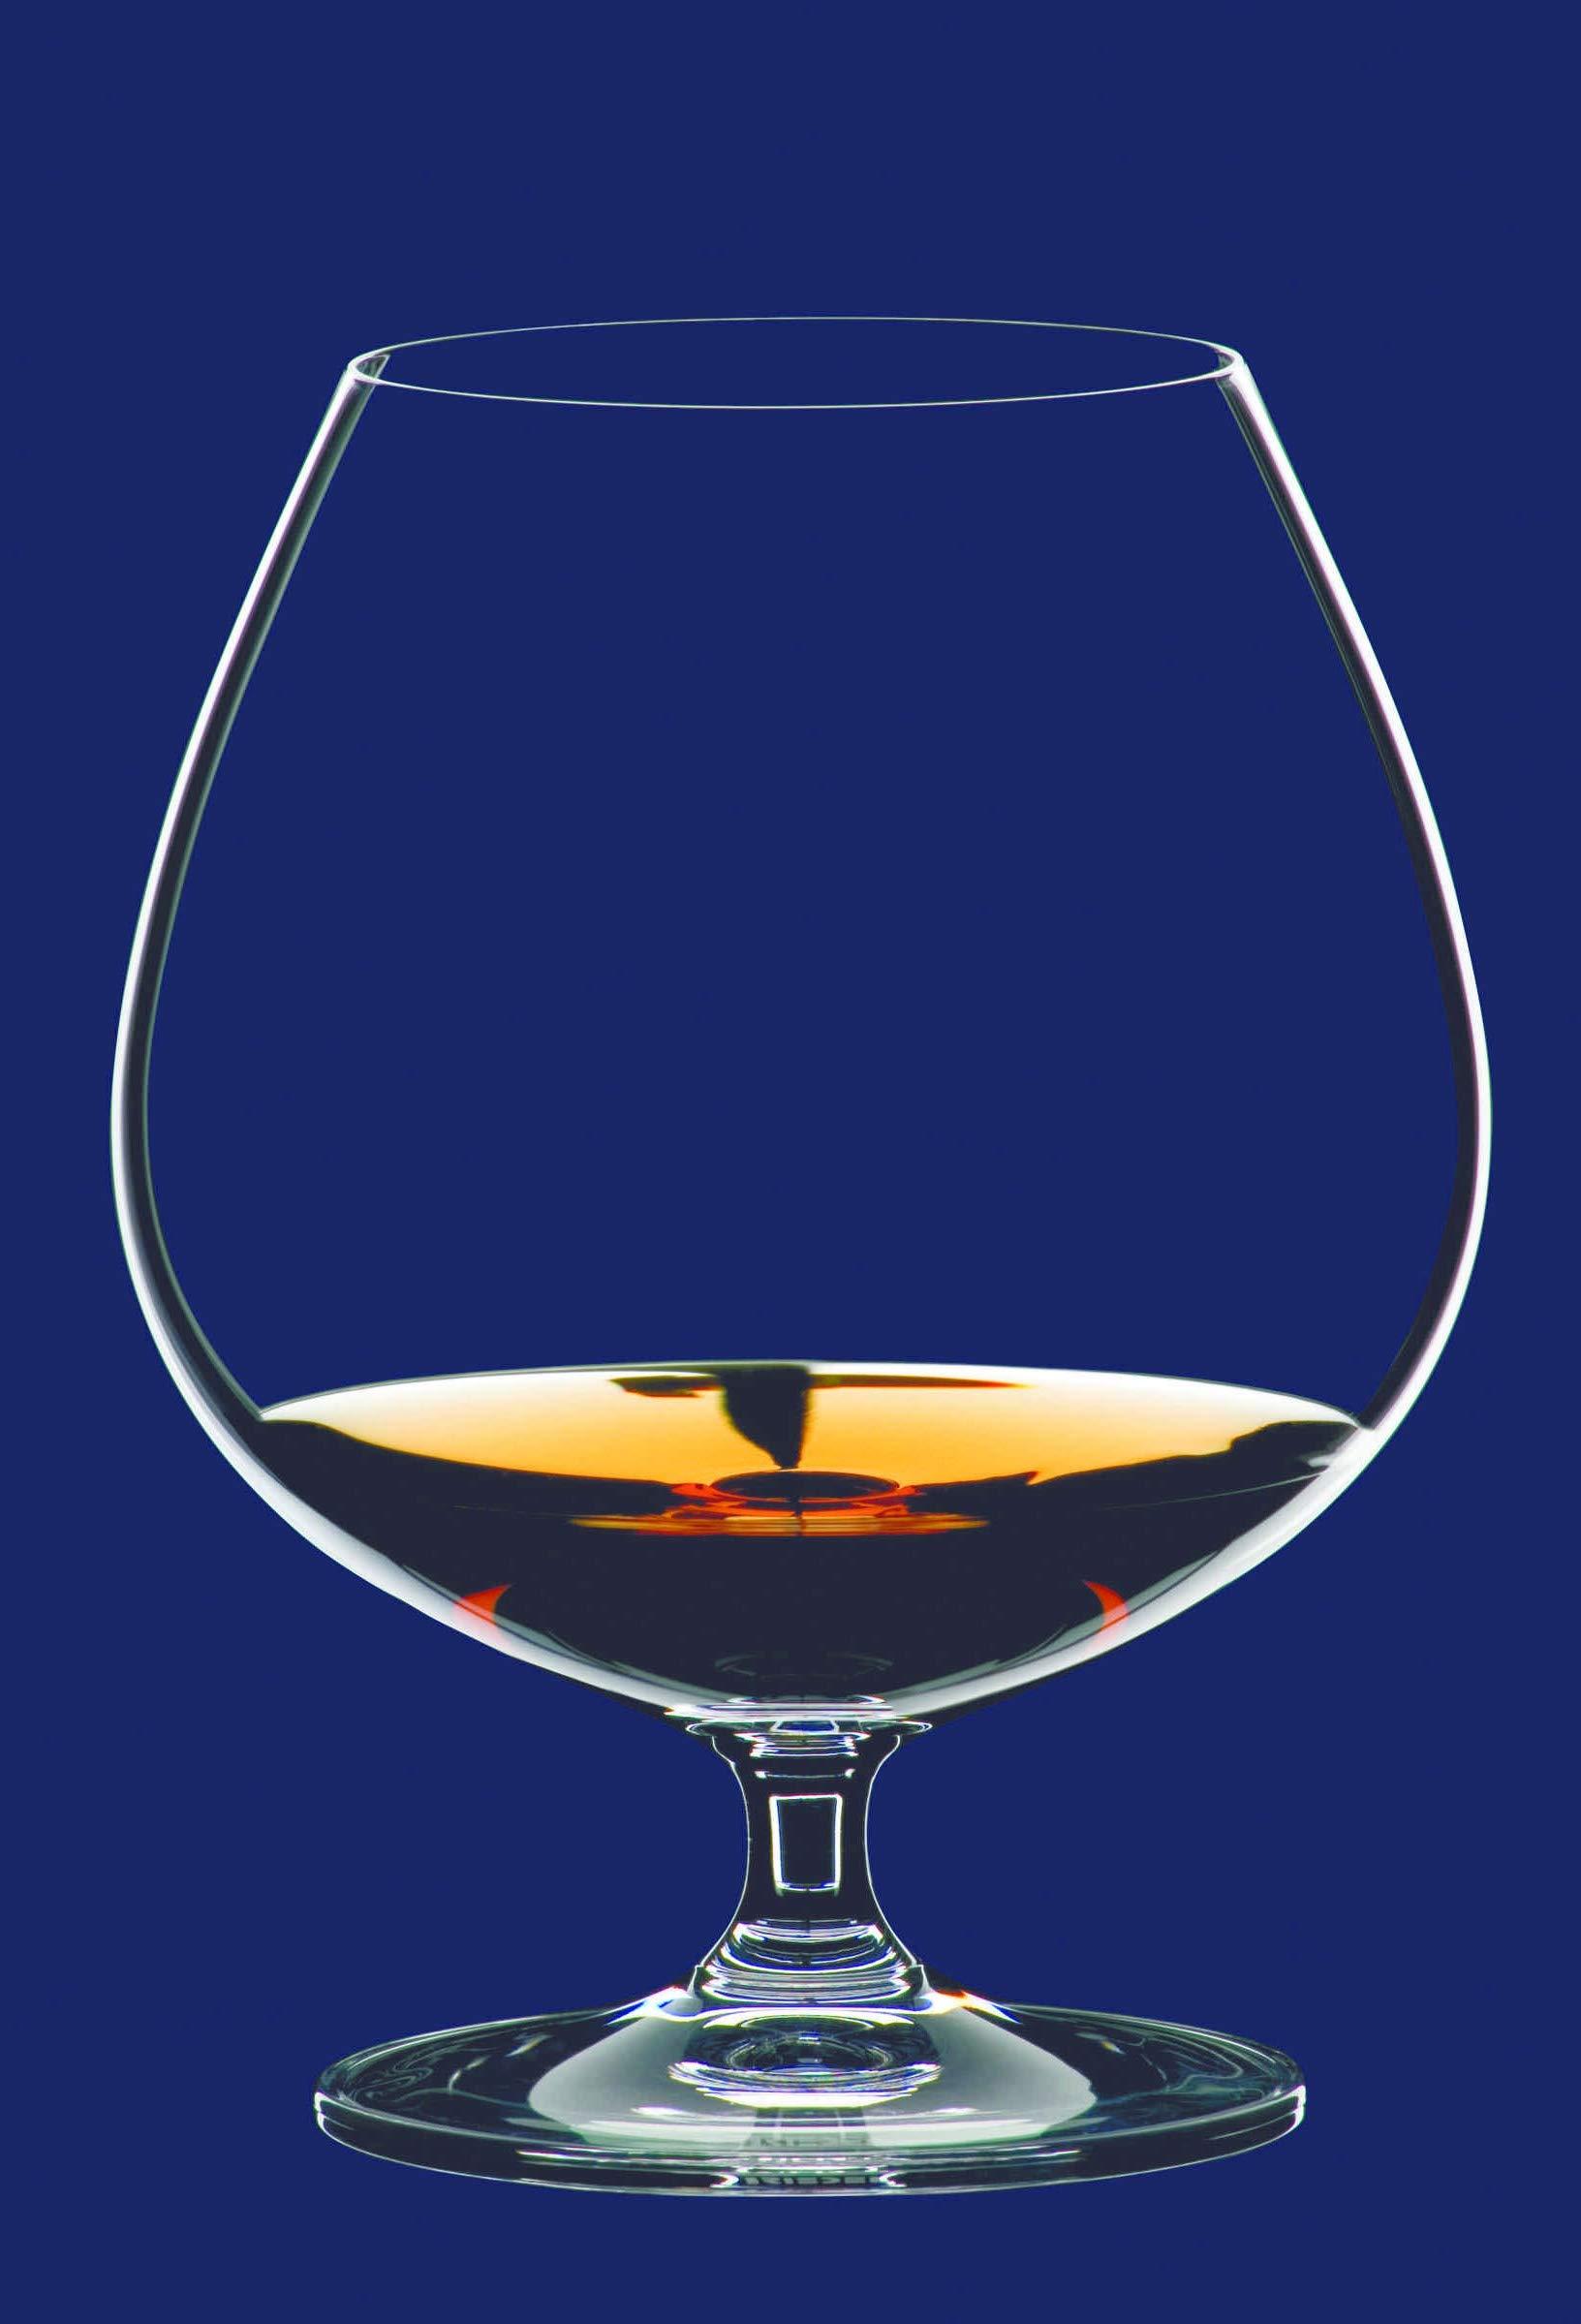 Riedel Vinum Brandy/Cognac Snifter, Set of 4 by Riedel (Image #2)